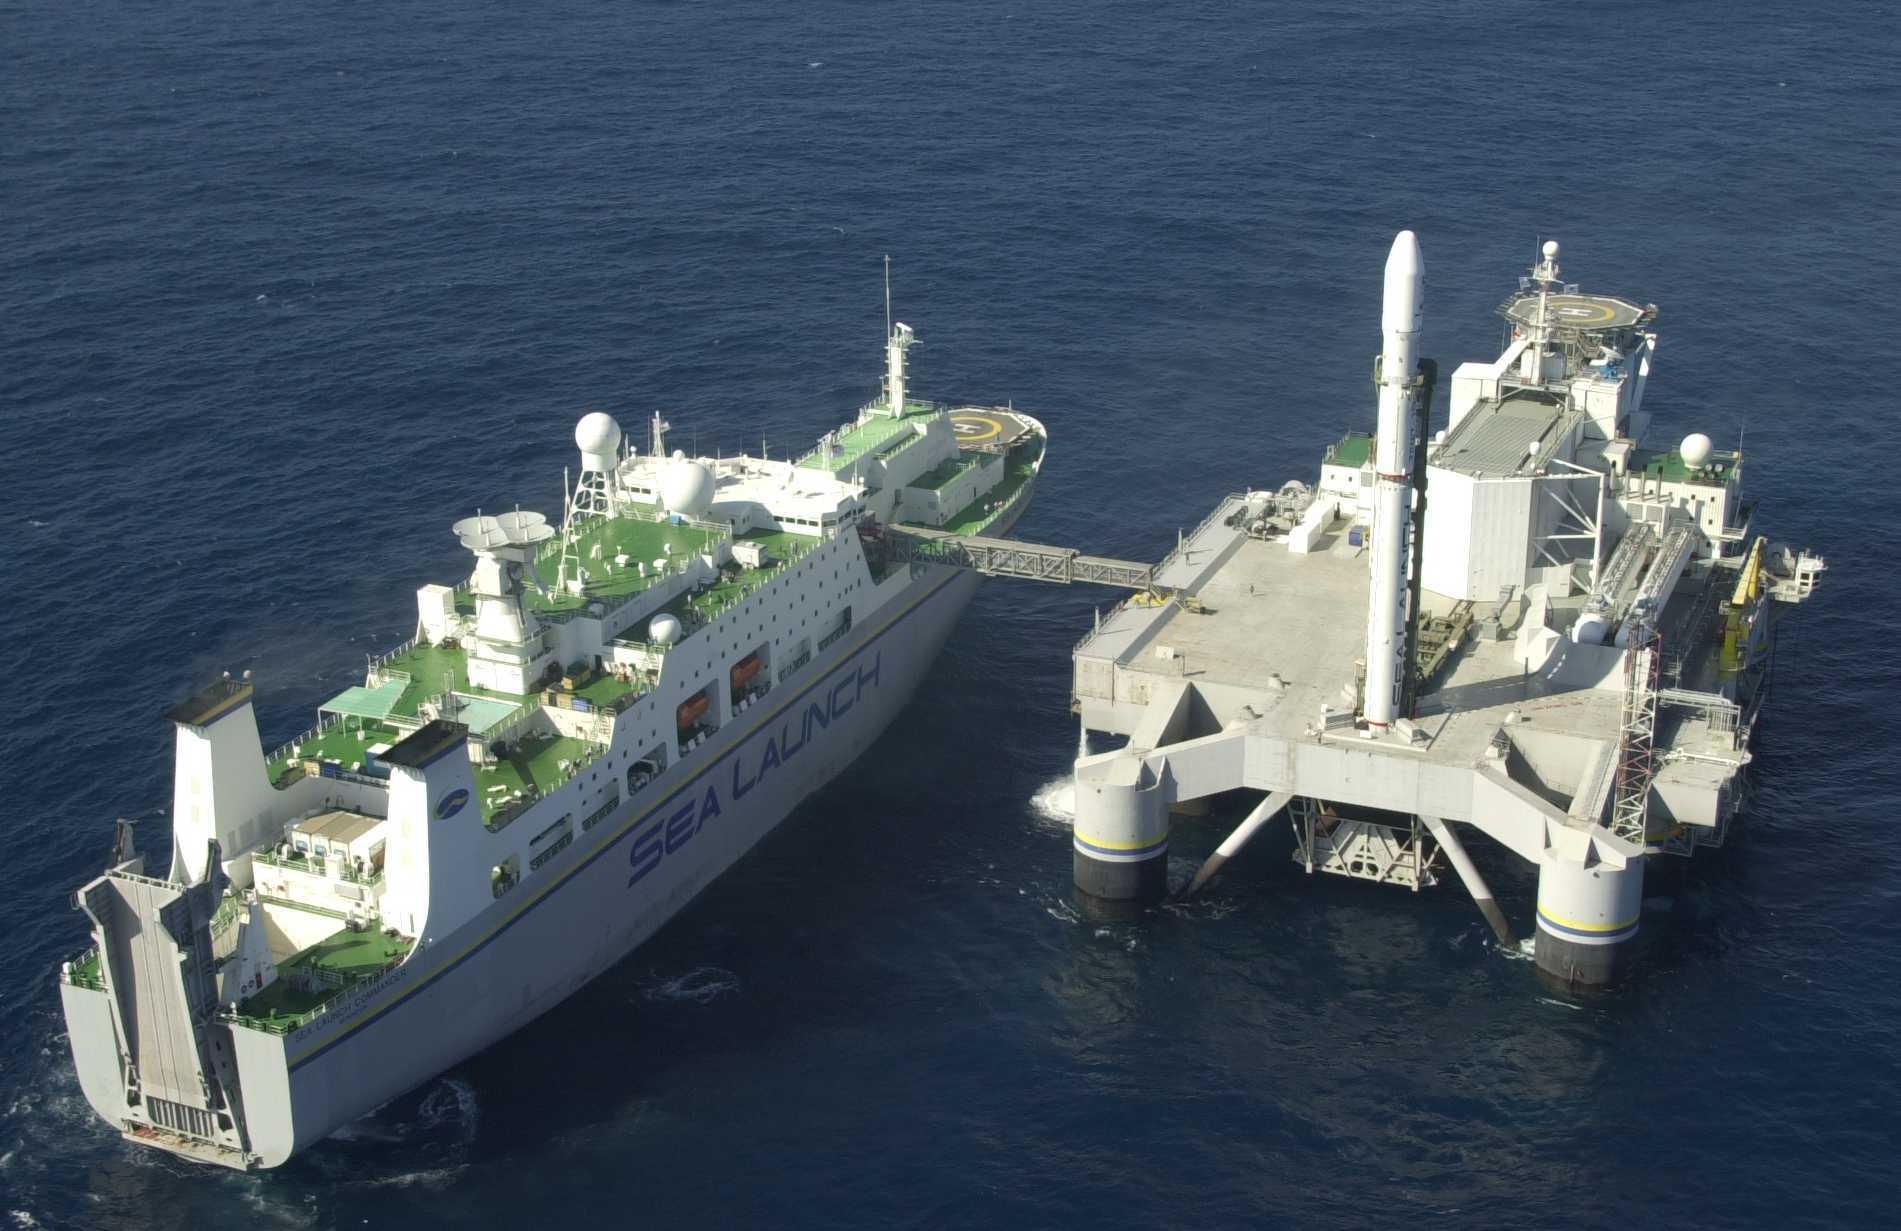 Cборочно-командное судно Sea Launch Commander